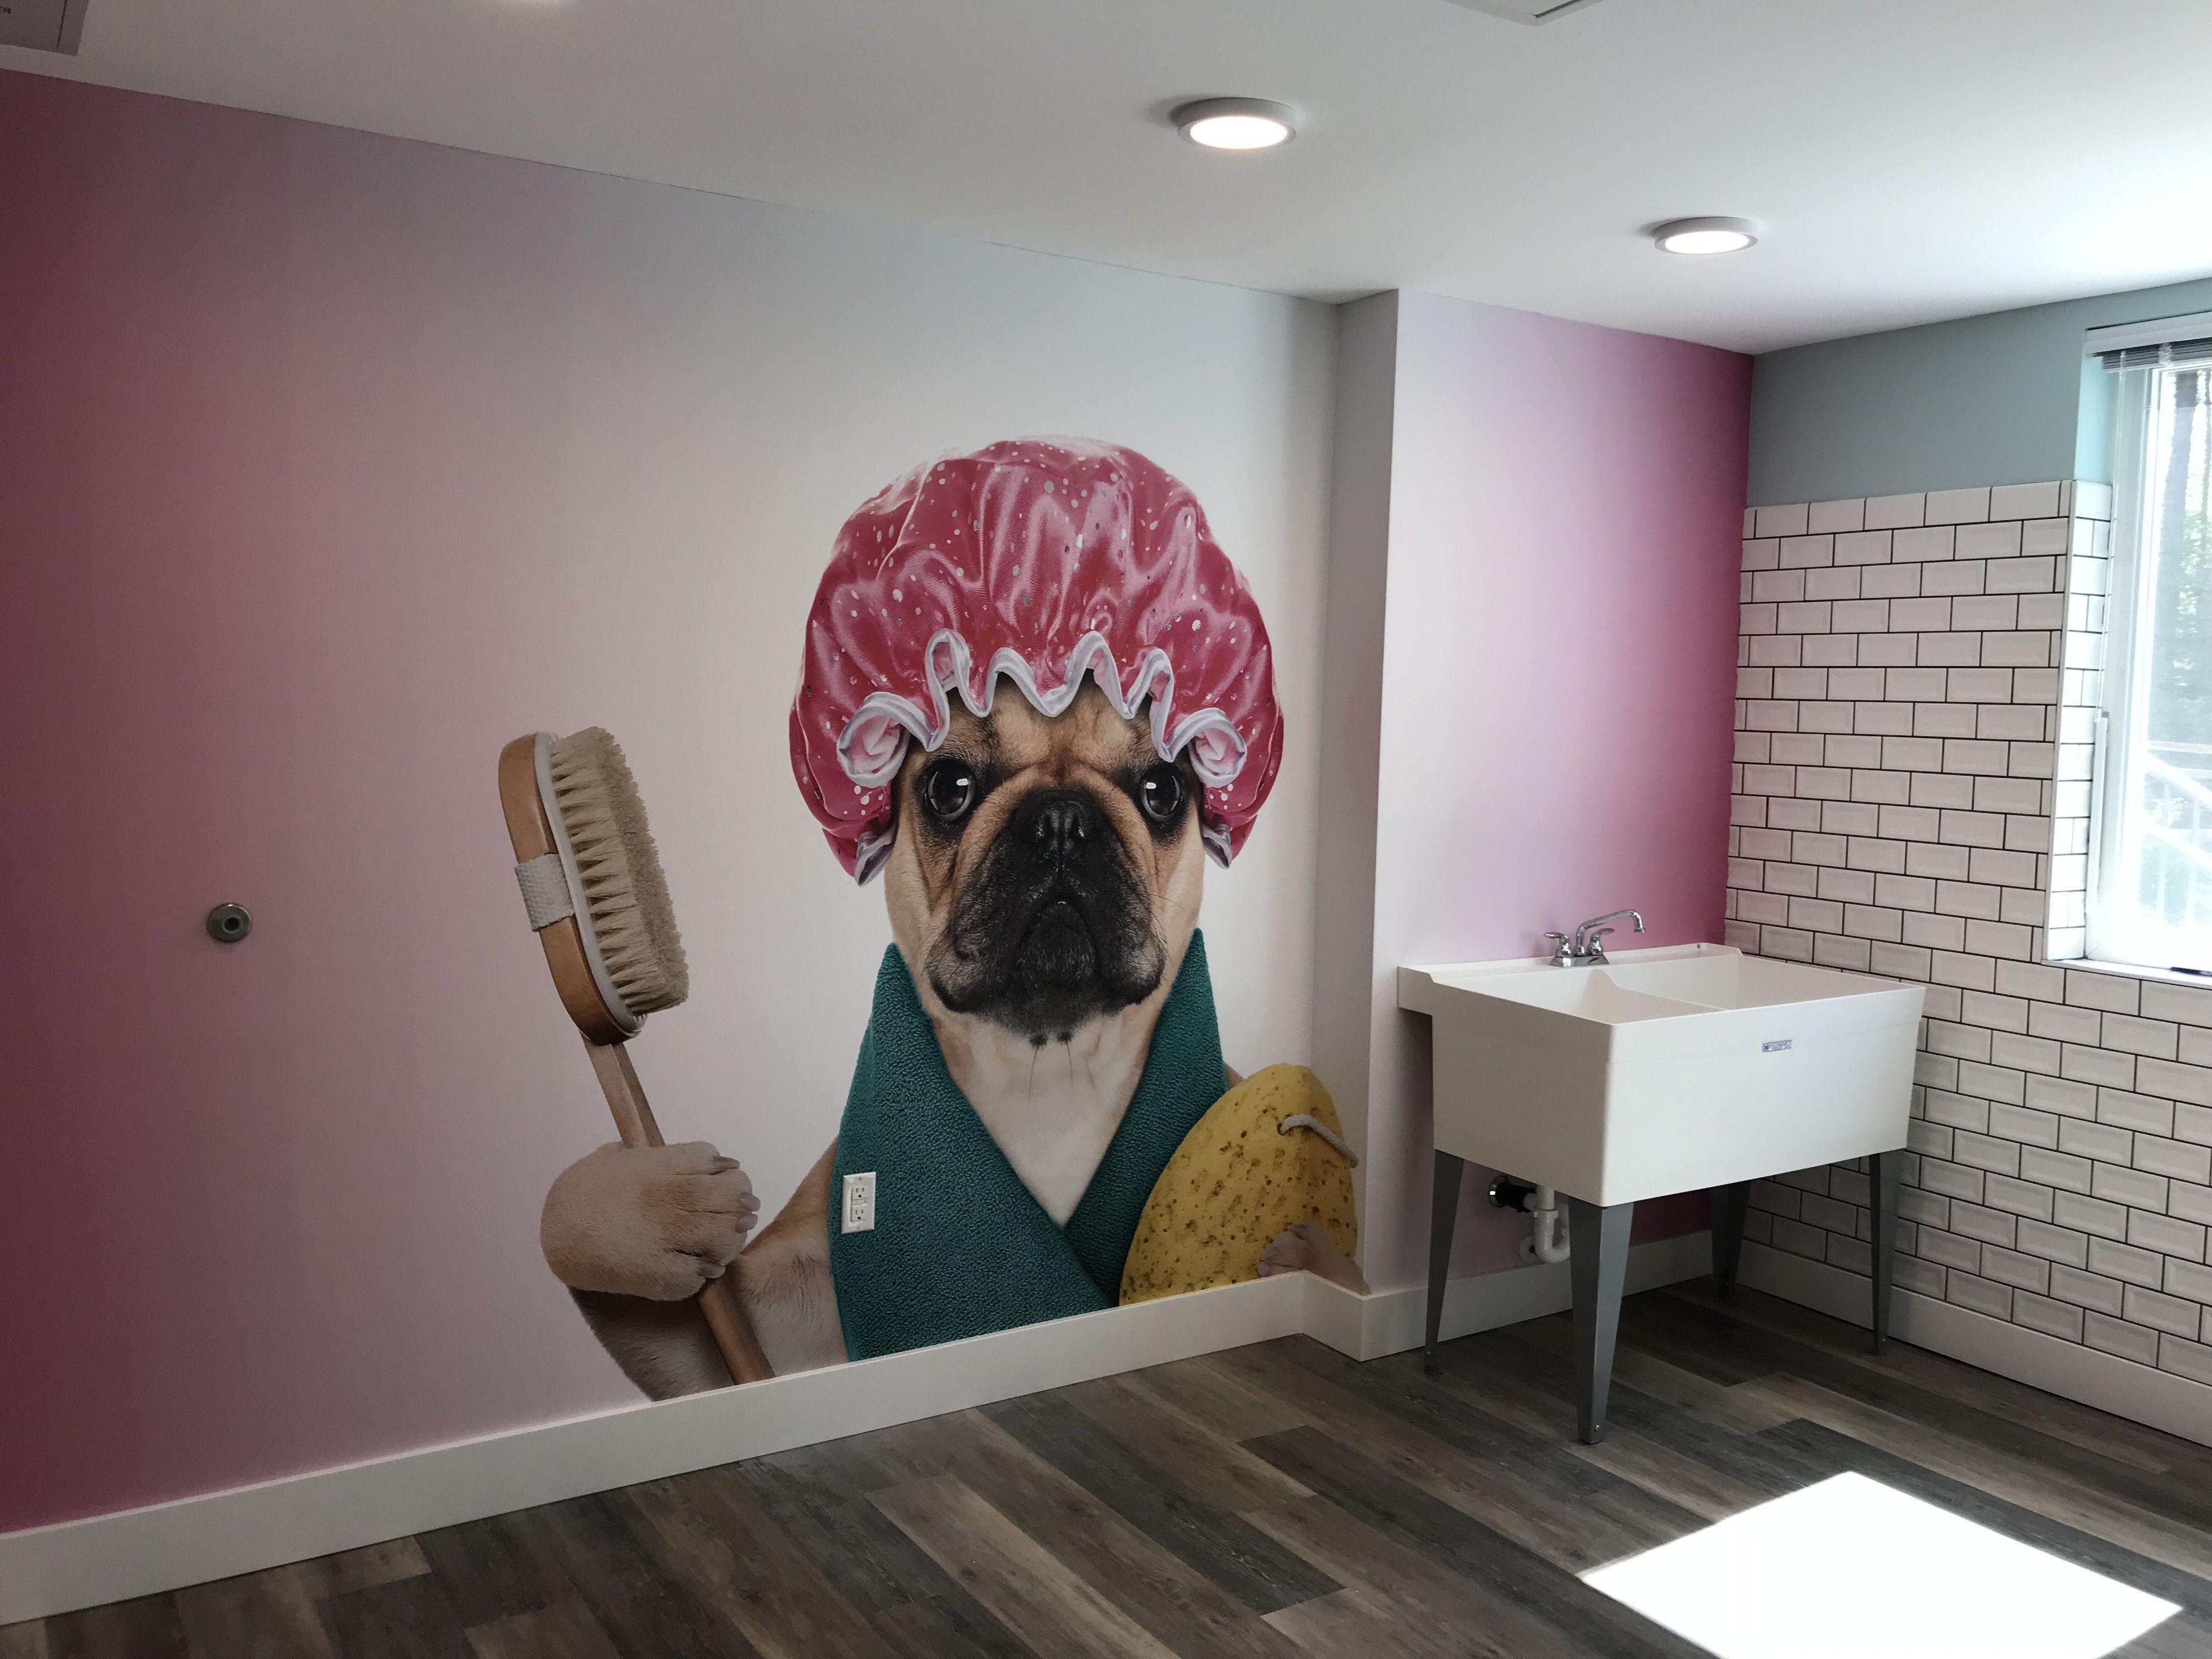 Dog Wash Station Pet Care Design Dog Wall Mural Dog Wall Decor Dog Wash Mural Wallpaper